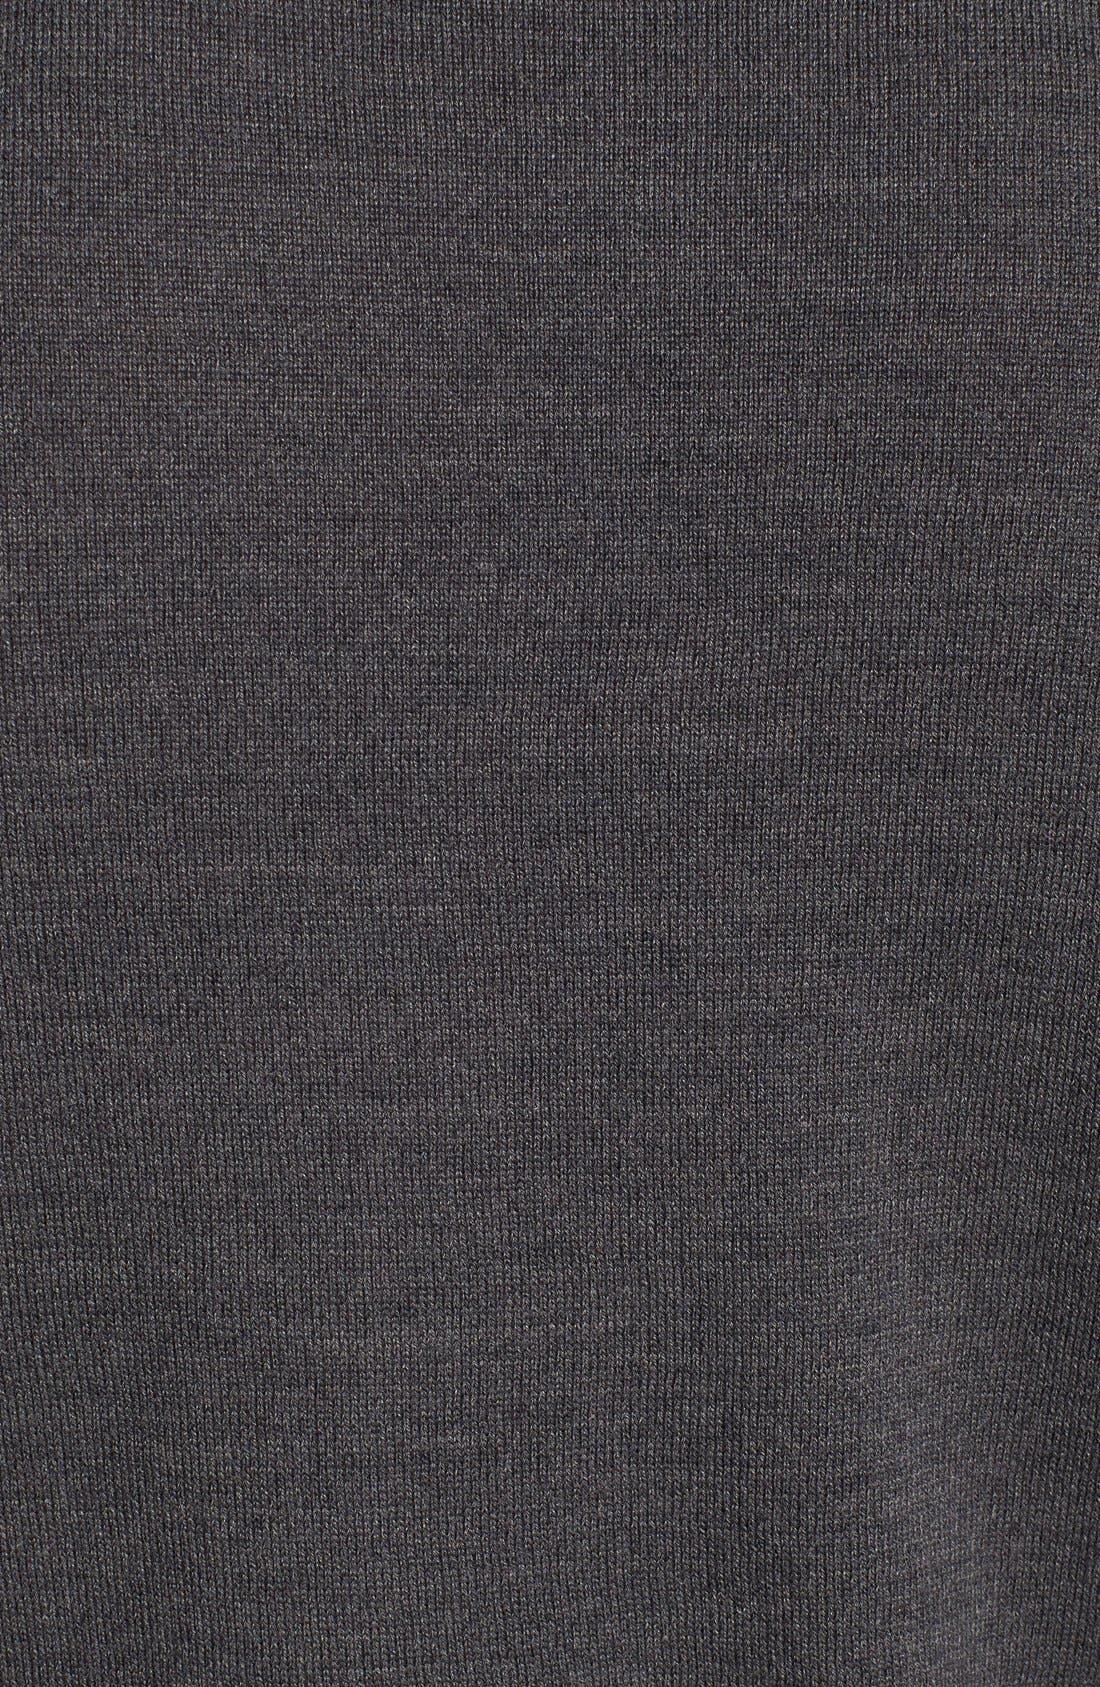 Merino Wool Turtleneck,                             Alternate thumbnail 9, color,